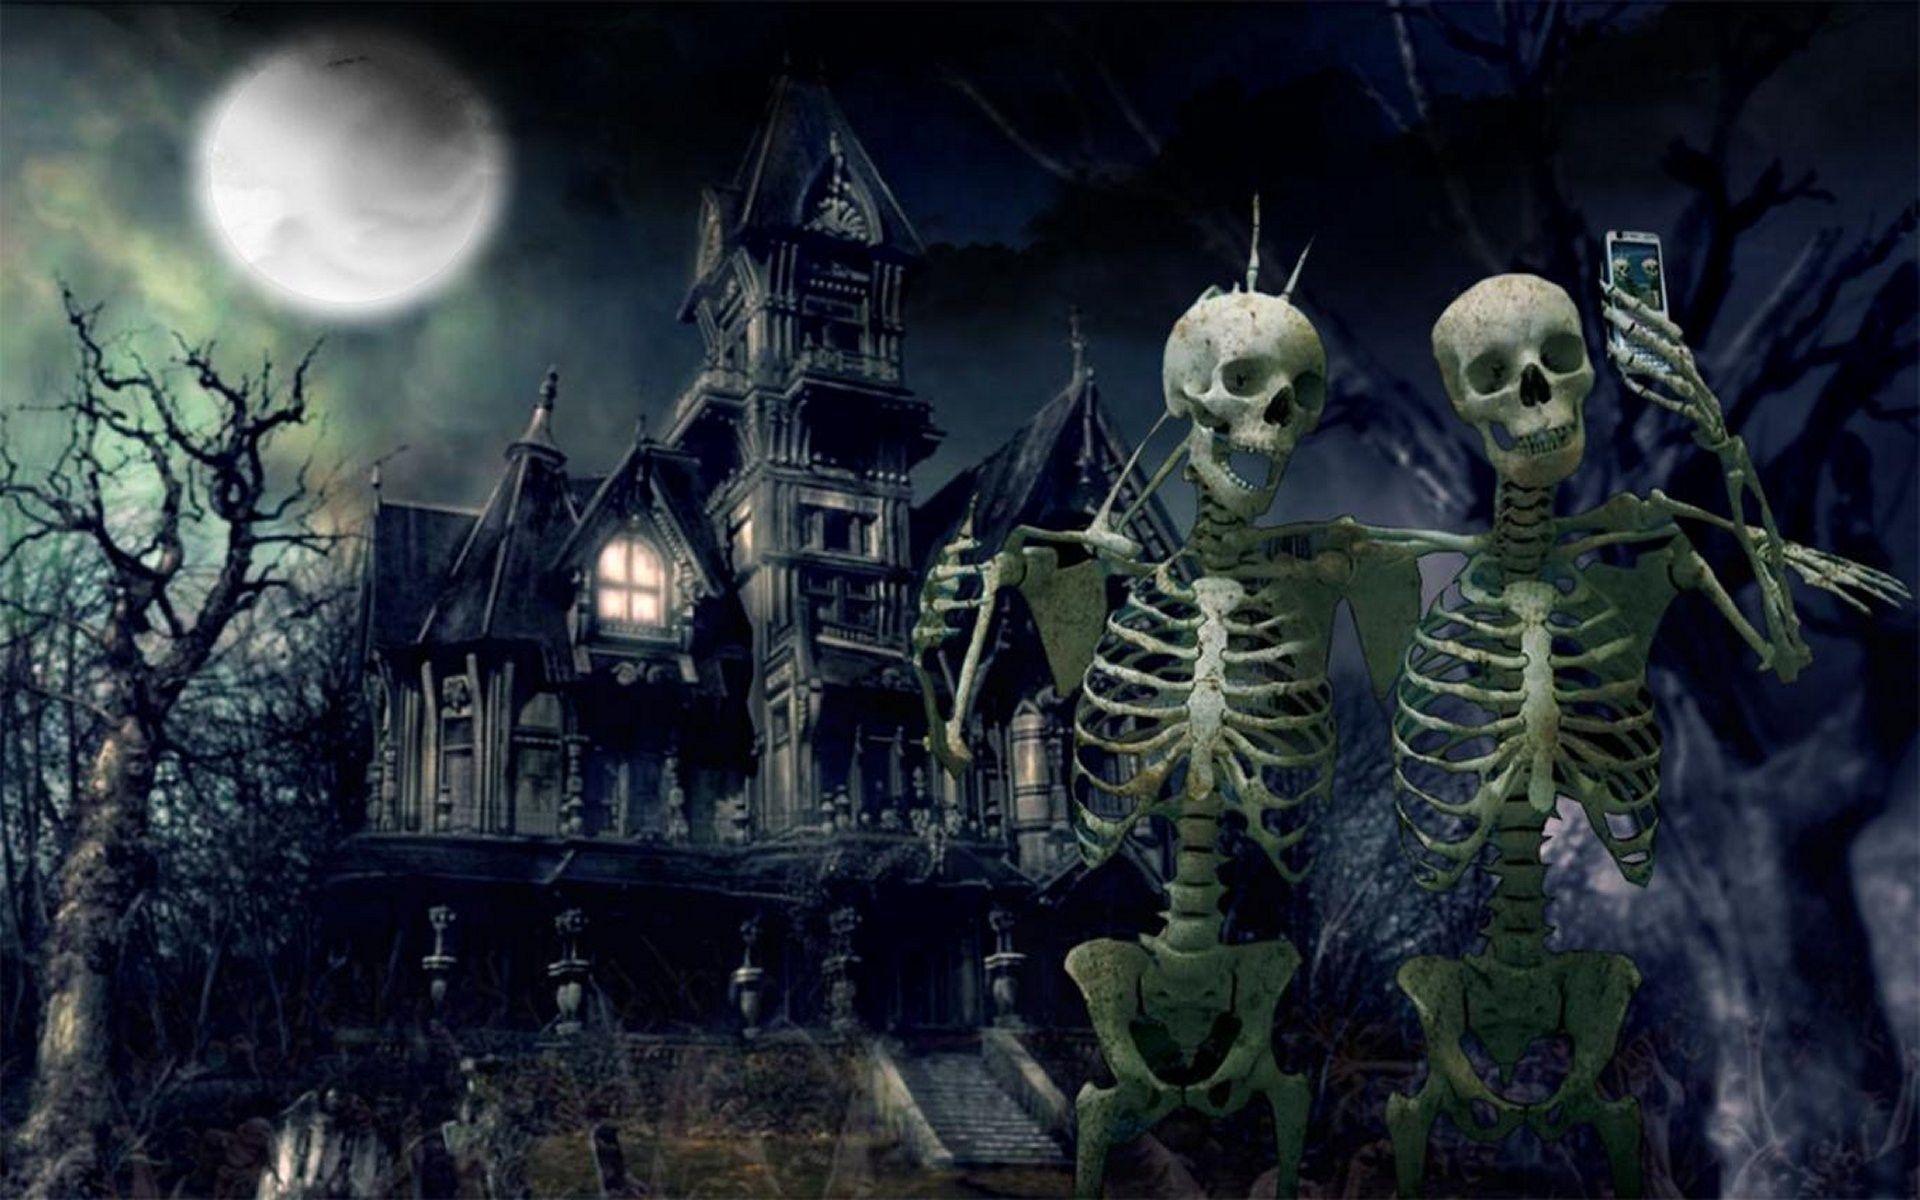 Best Wallpaper Halloween Haunted - 20c8a7f21ae9f32f888fee78c9538891  Pic_59937.jpg